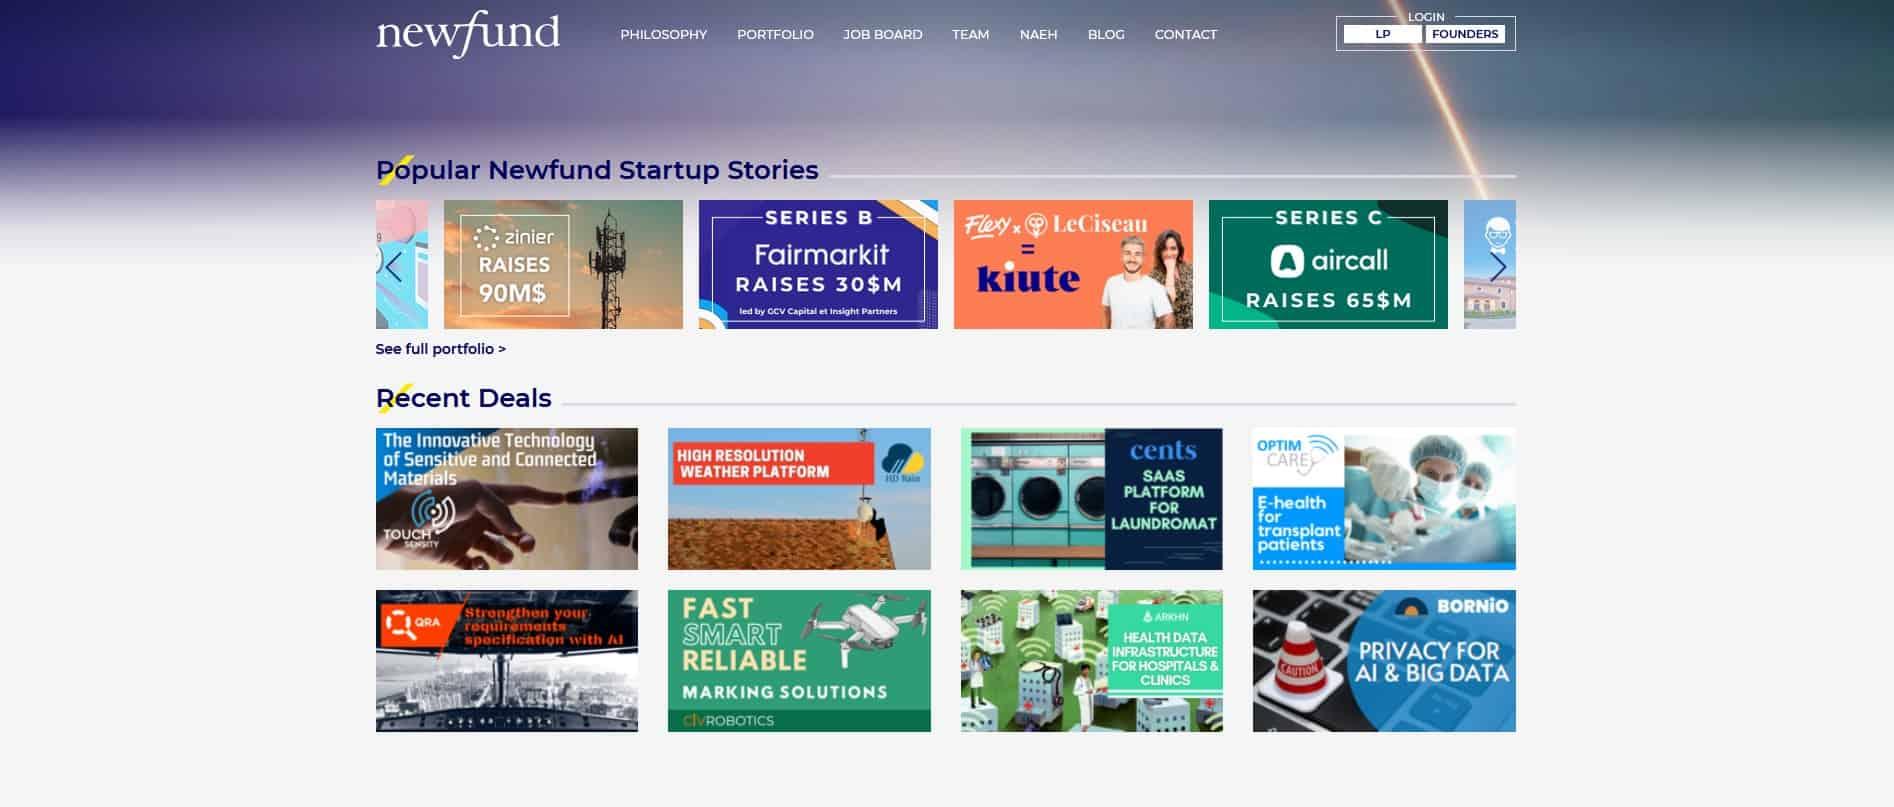 Newfund Capital